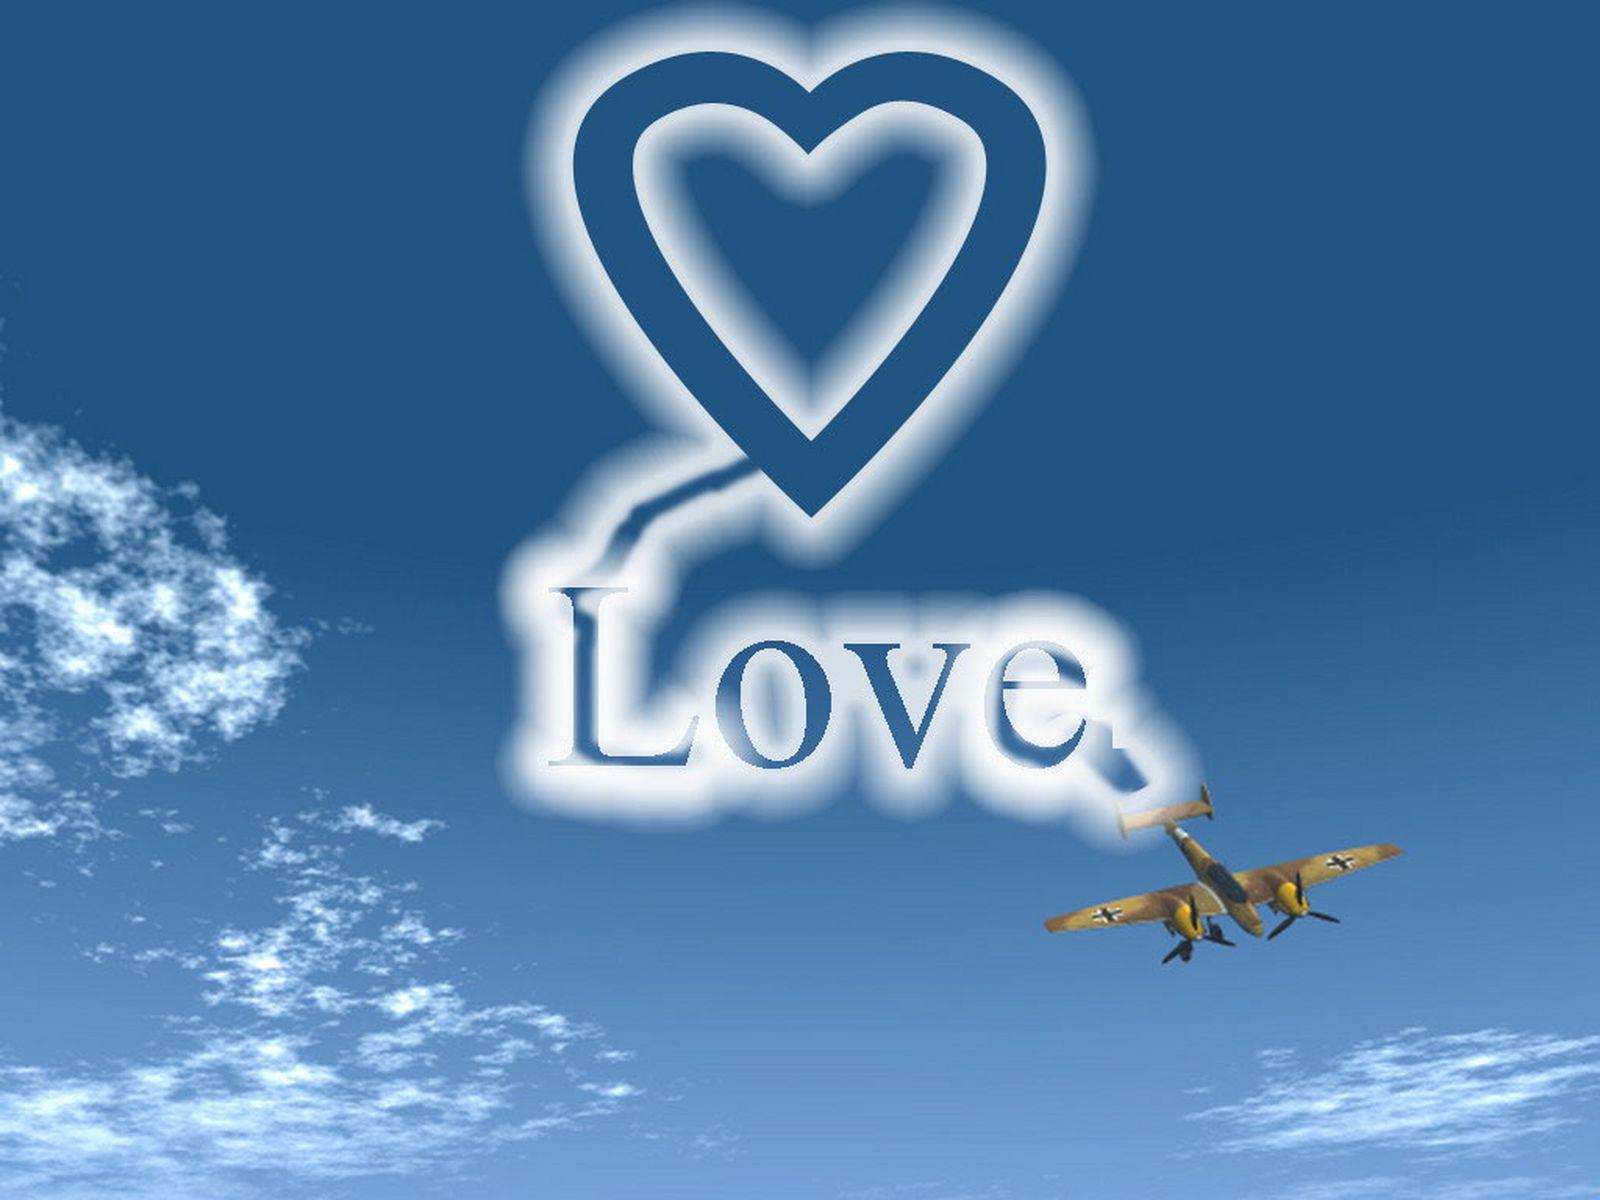 Blauwe wallpapers hd wallpapers - Love f wallpaper hd download ...